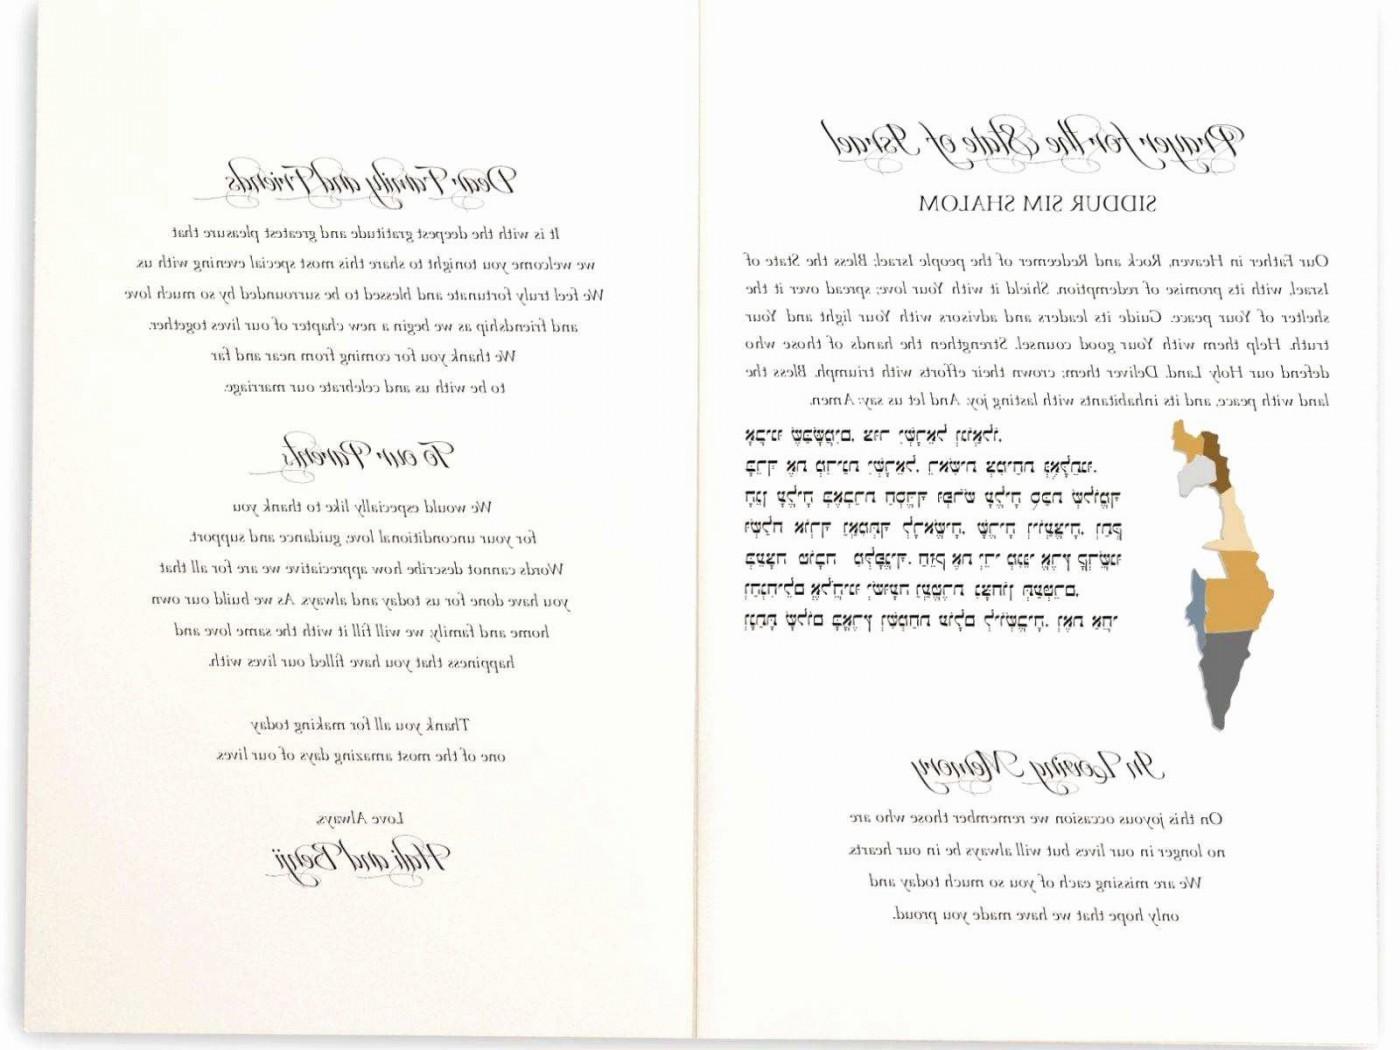 Catholic Wedding Mass Booklet Template